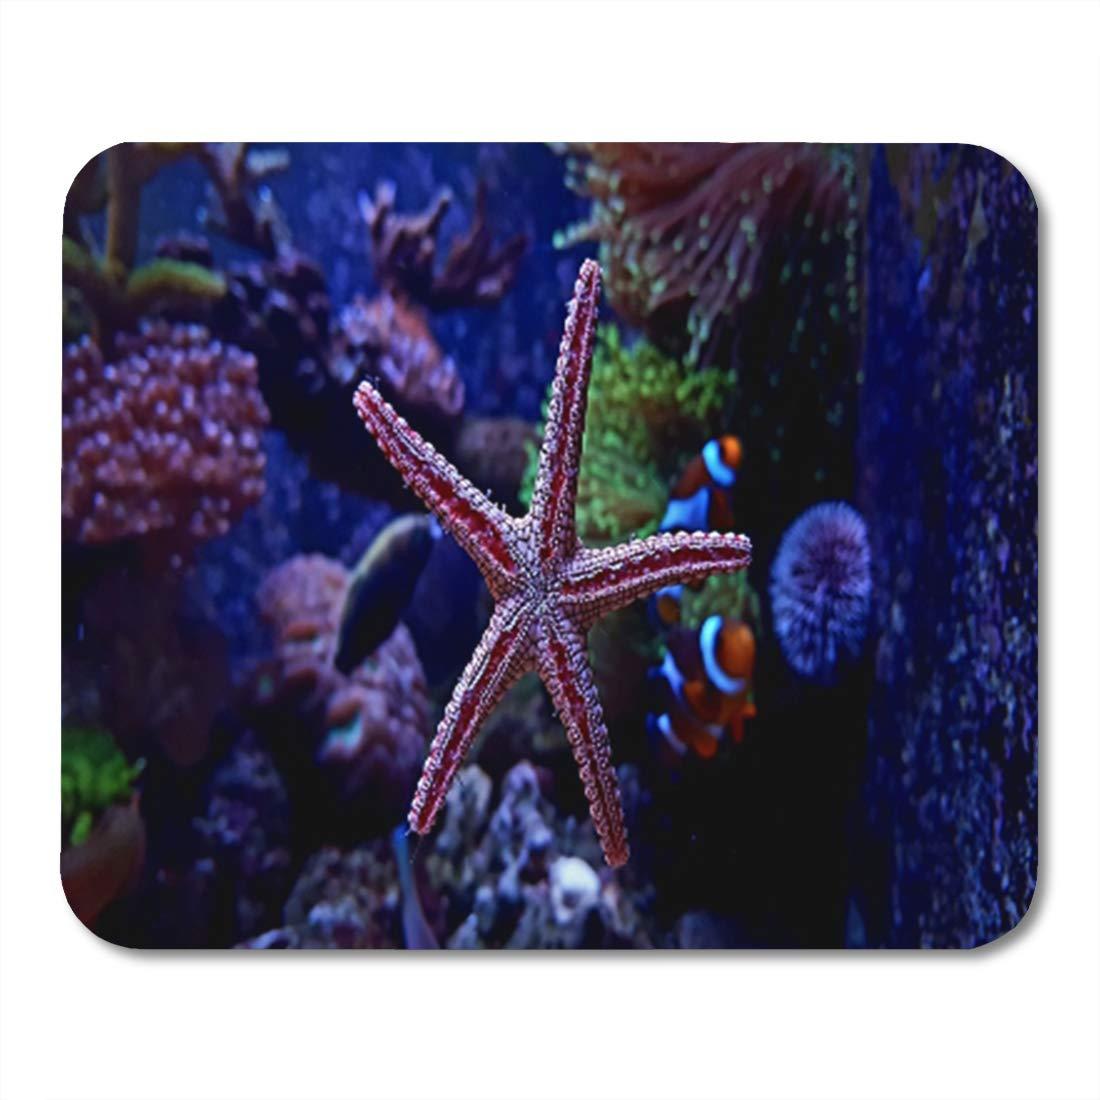 Amazoncom Semtomn Gaming Mouse Pad Underwater Colorful Seastar 1100x1100